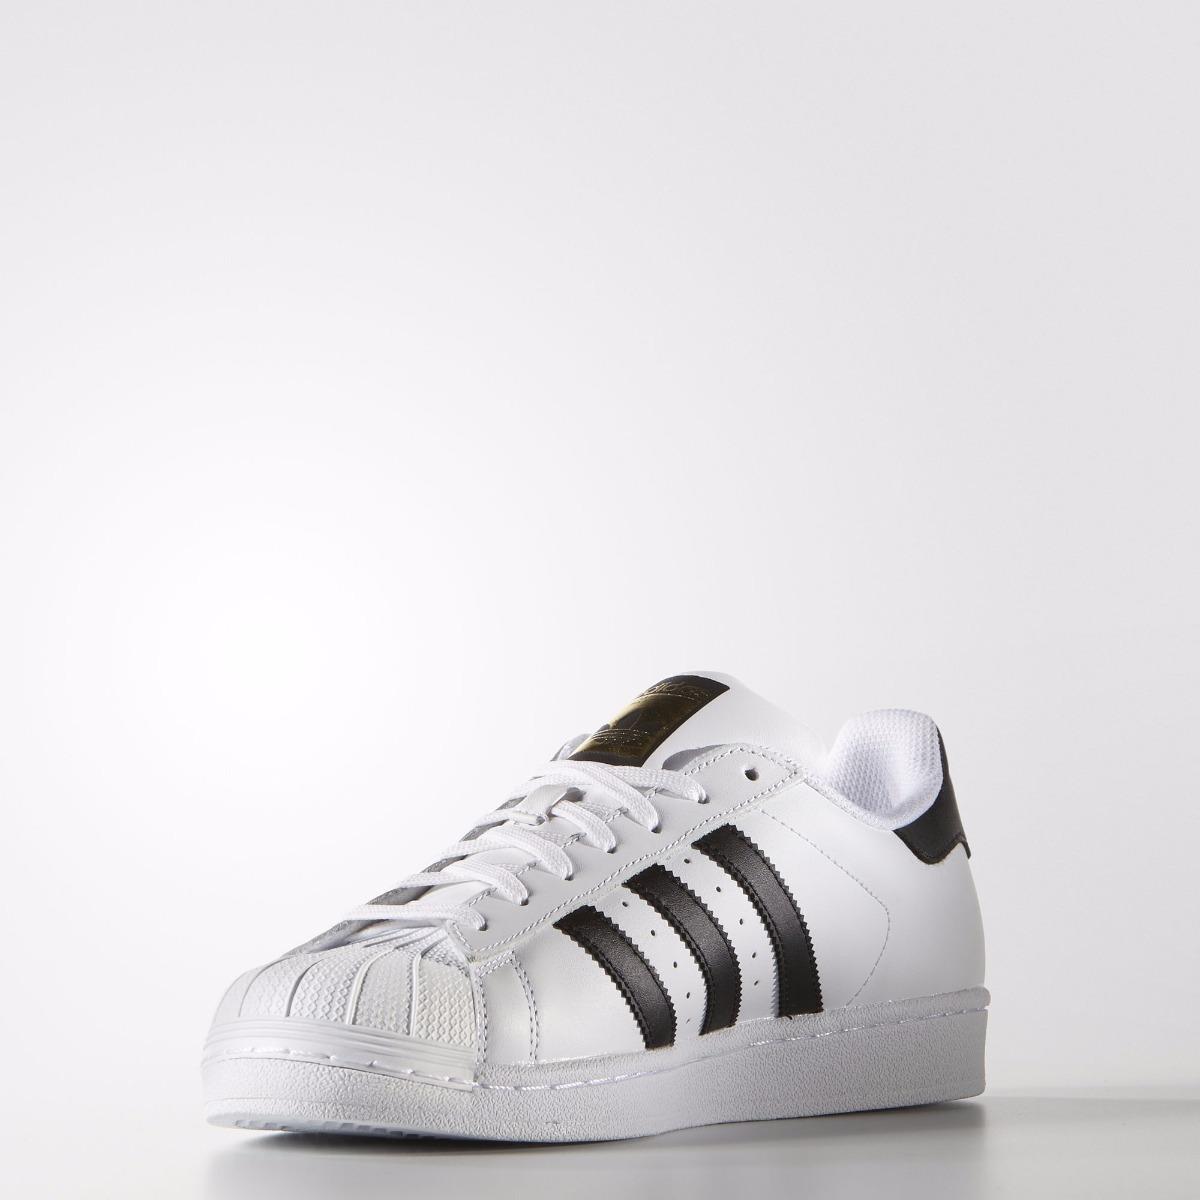 the best attitude d0de6 fecb2 ... top quality zapatillas adidas superstar originals blanco para mujer.  cargando zoom. 65b88 9f03d